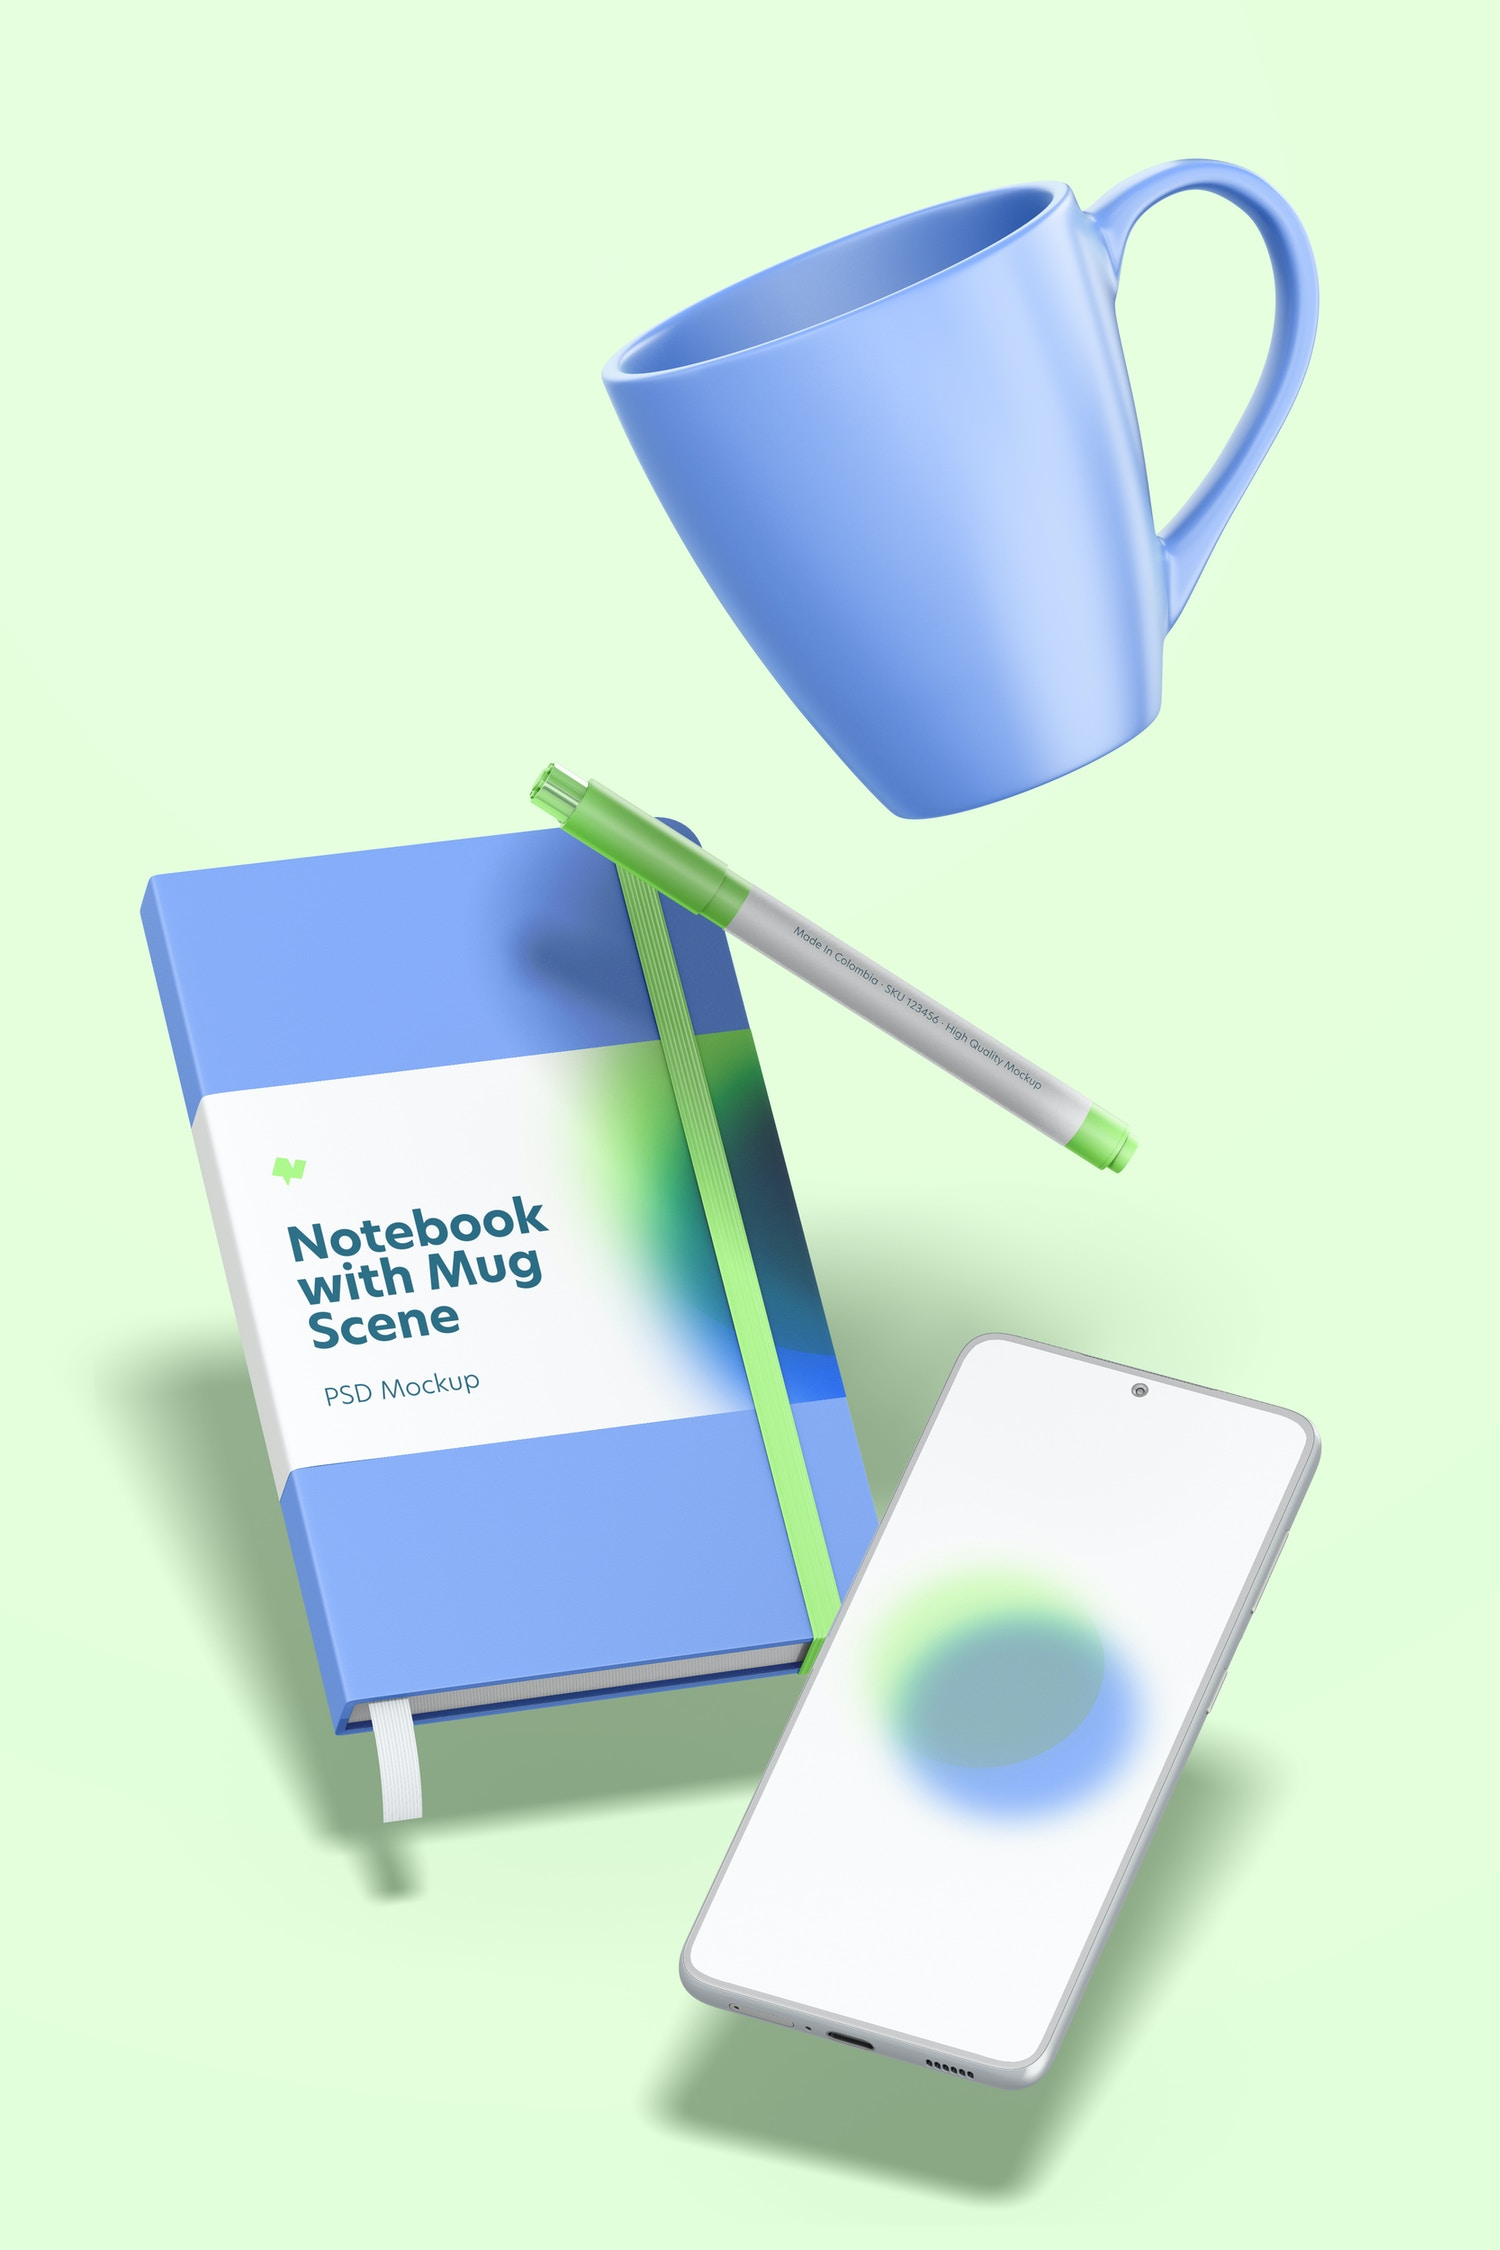 Notebook with Mug Scene Mockup, Falling